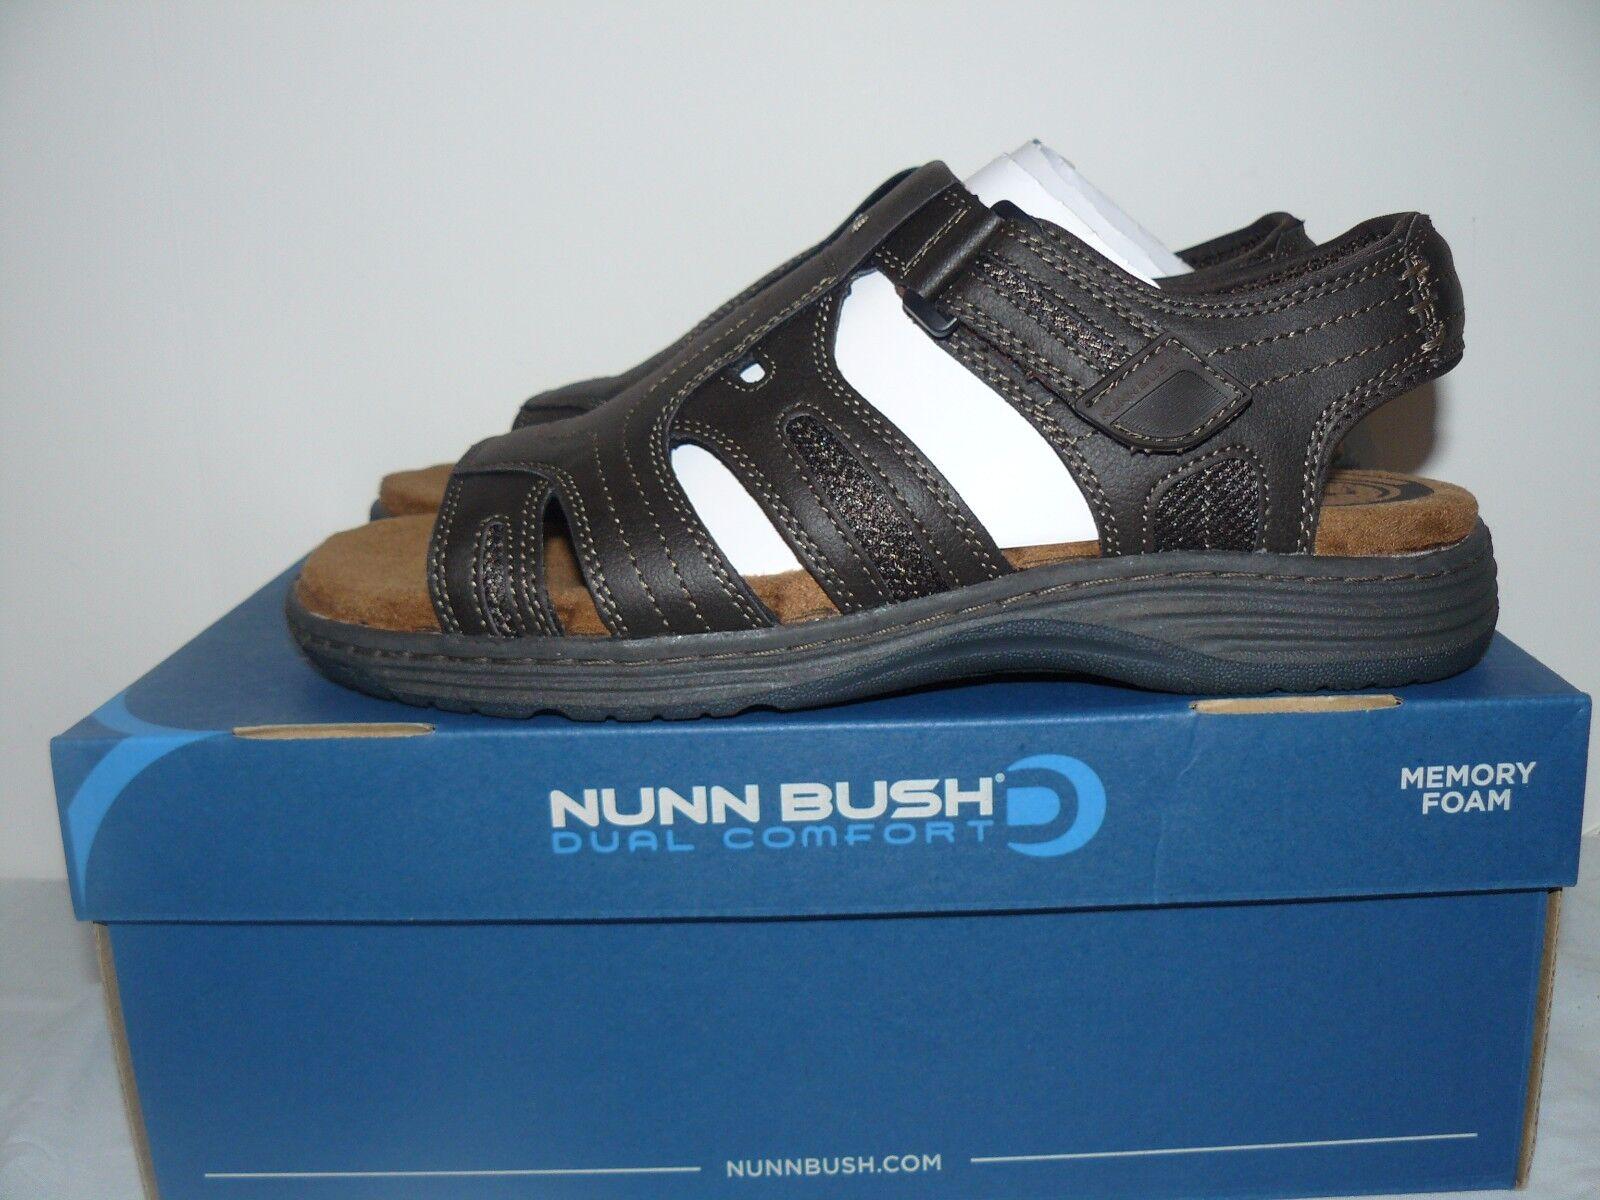 Nuevo En Caja Para Hombre Nunn Bush Ritter Doble comodidad marrón Sandalias Tamaño 9,10,11,12,13